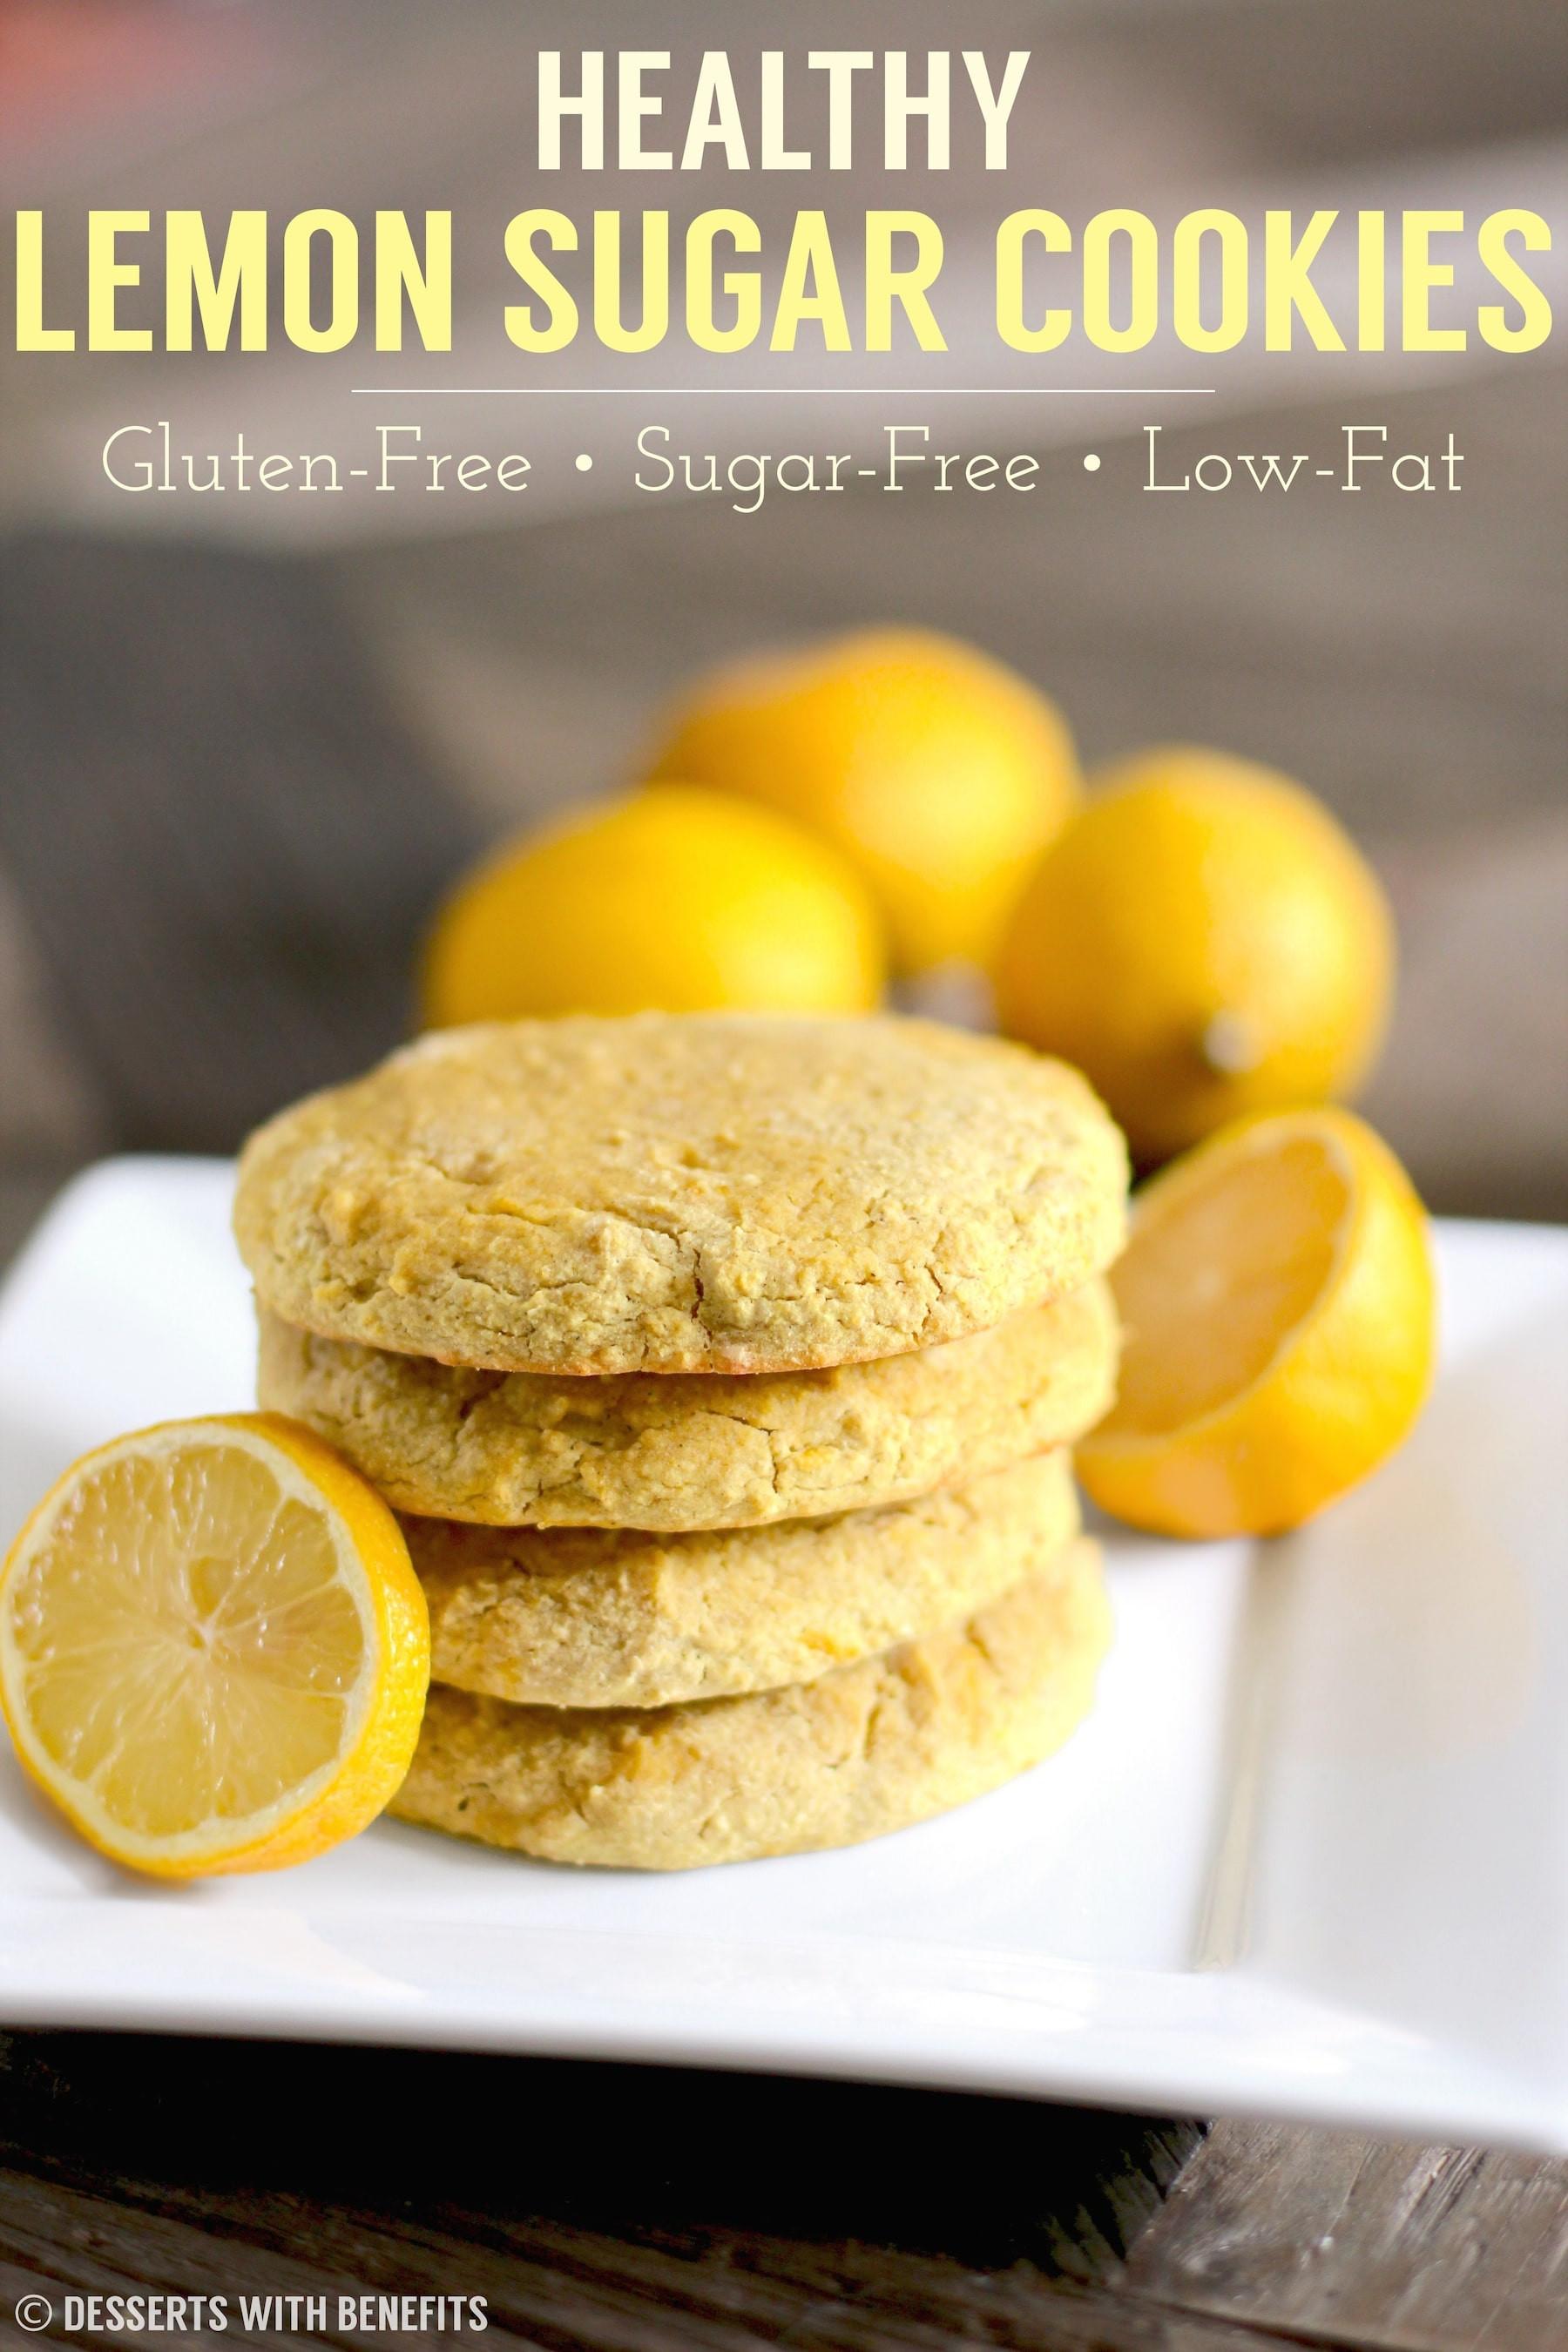 Sugar Free Gluten Free Dessert  Soft Chewy Lemon Sugar Cookies Recipe